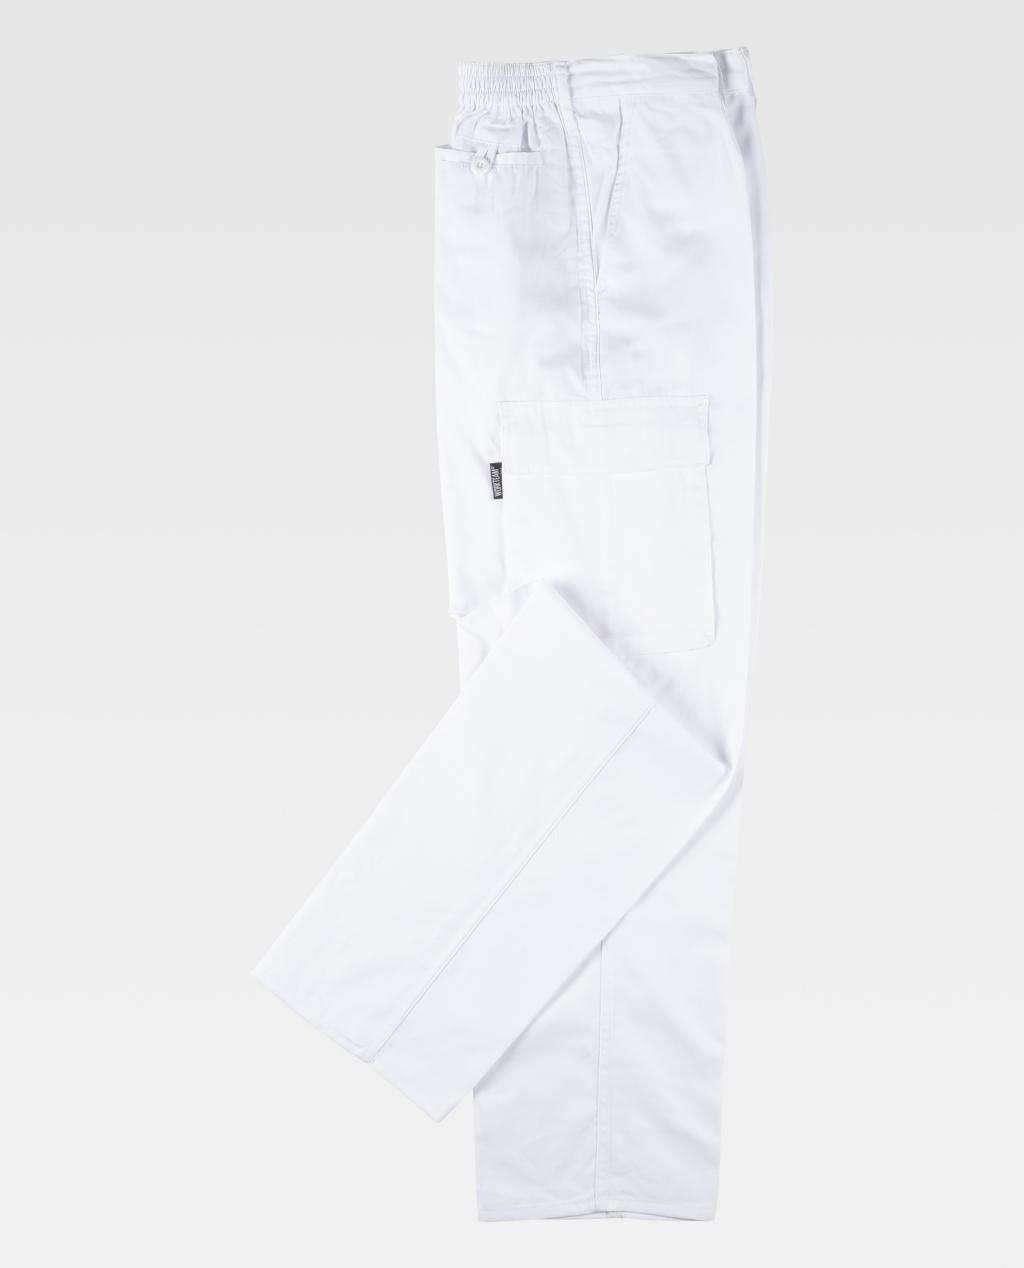 Calça W/T B1403 c/elástico Multibolsos